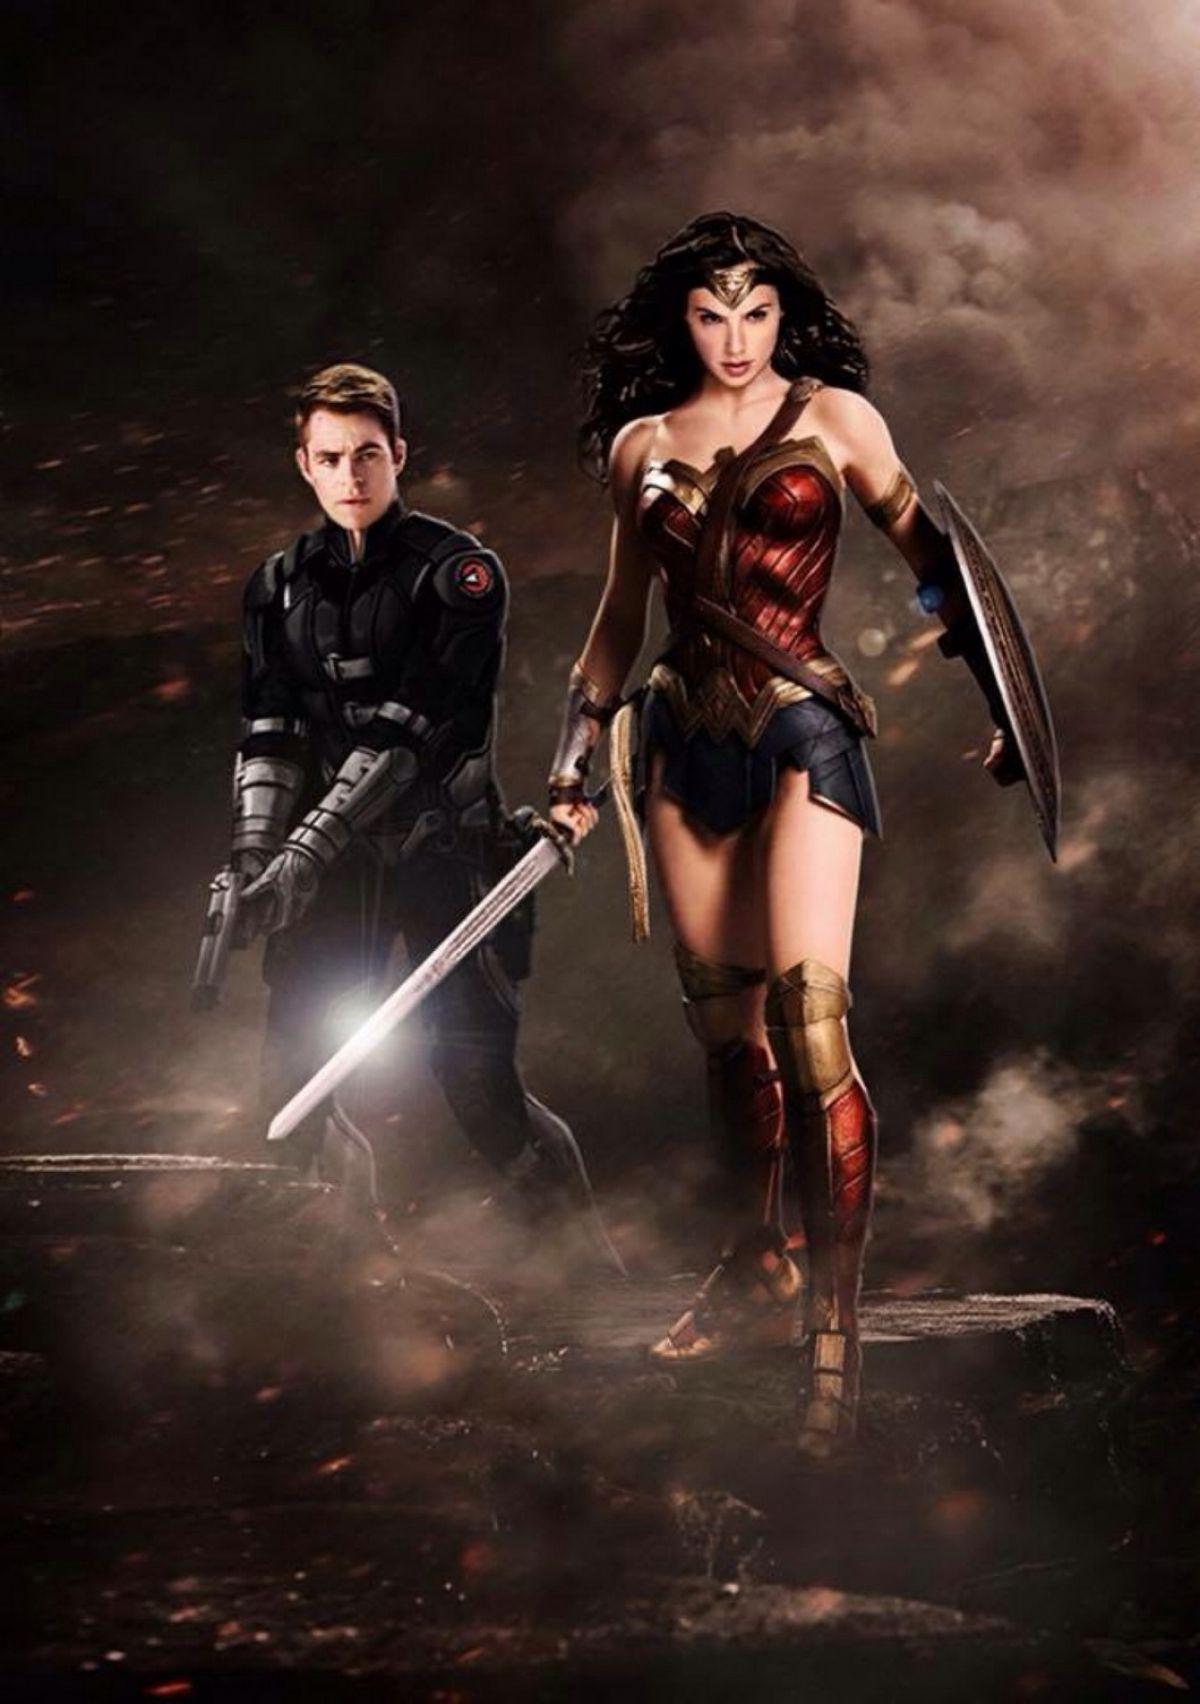 Batman vs superman vs wonder woman-9357